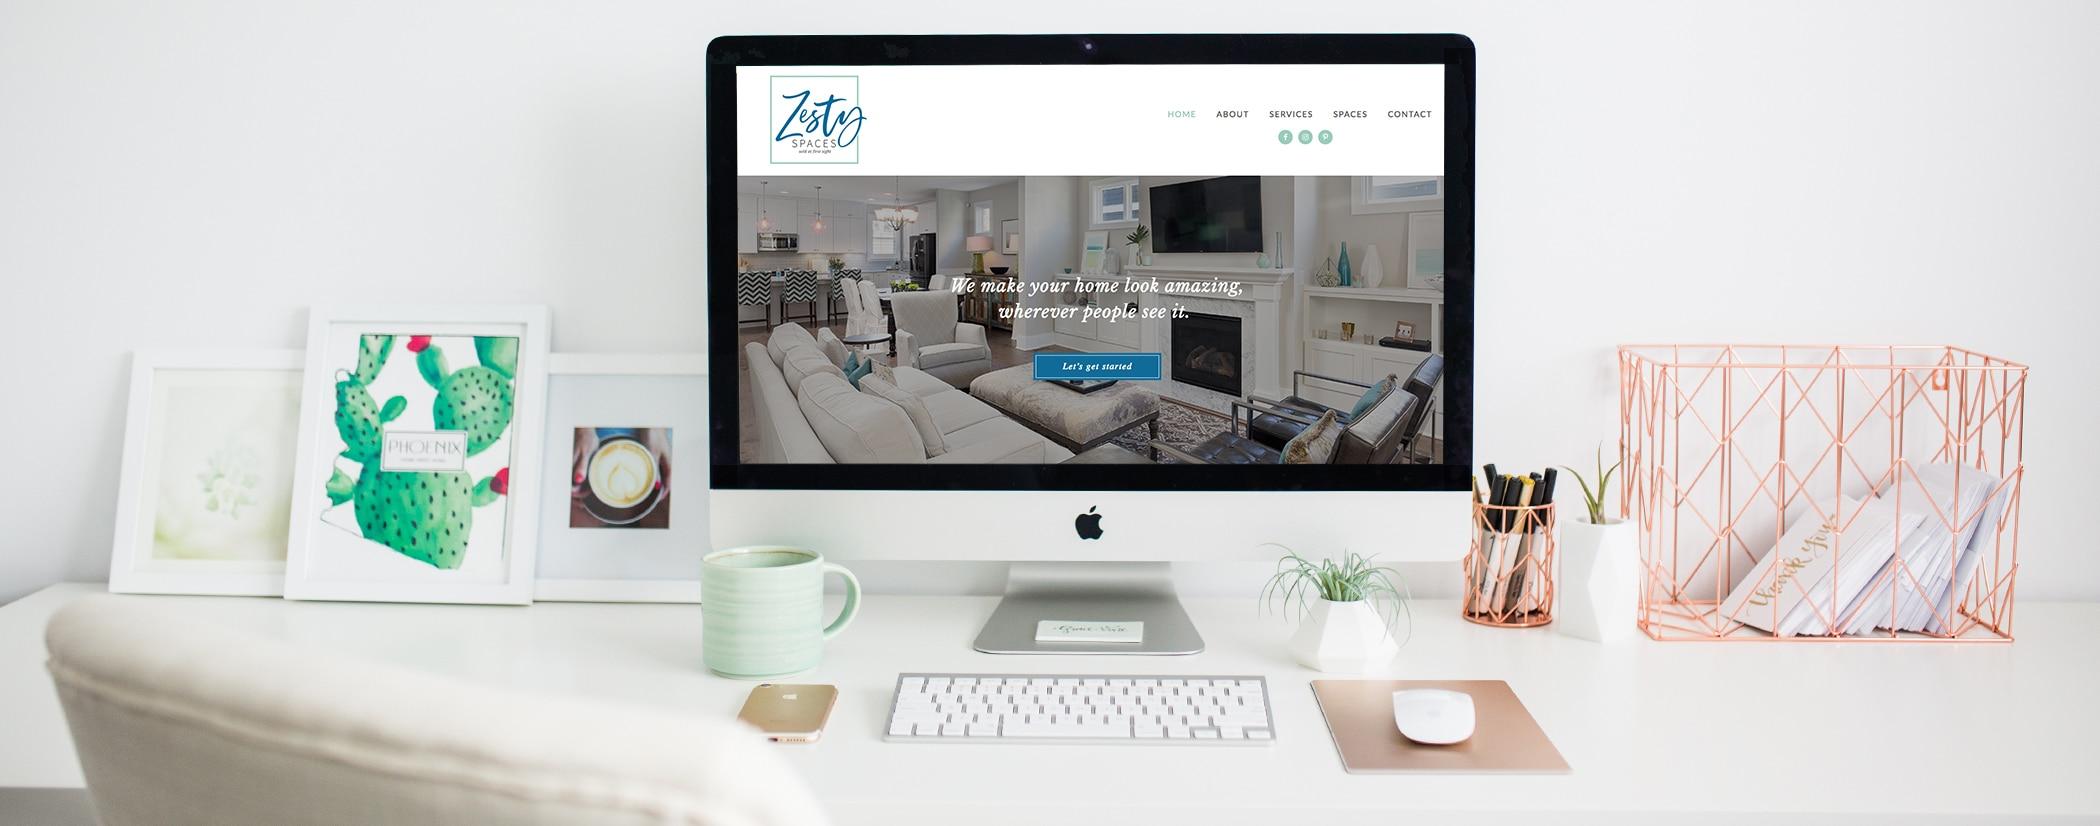 home-staging-website-design-grace-and-vine-optimized